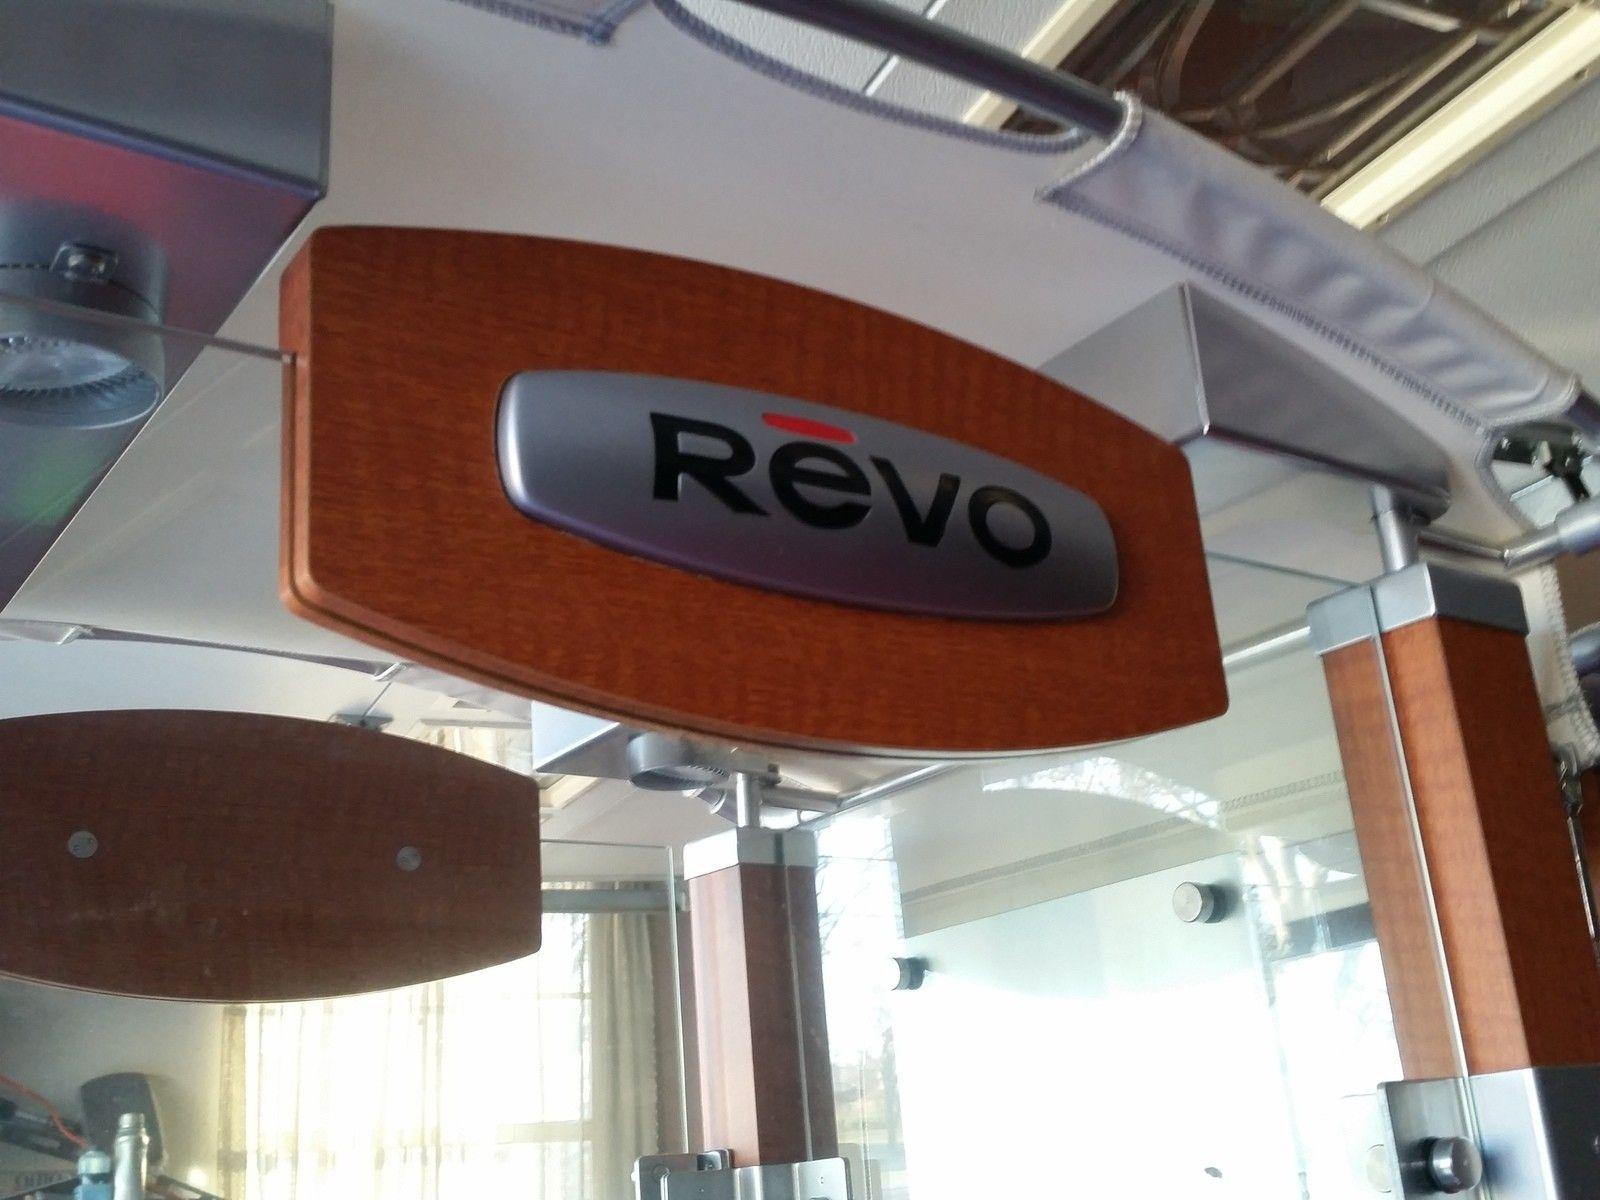 Converted Revo Cases - 20150110_162435.jpg